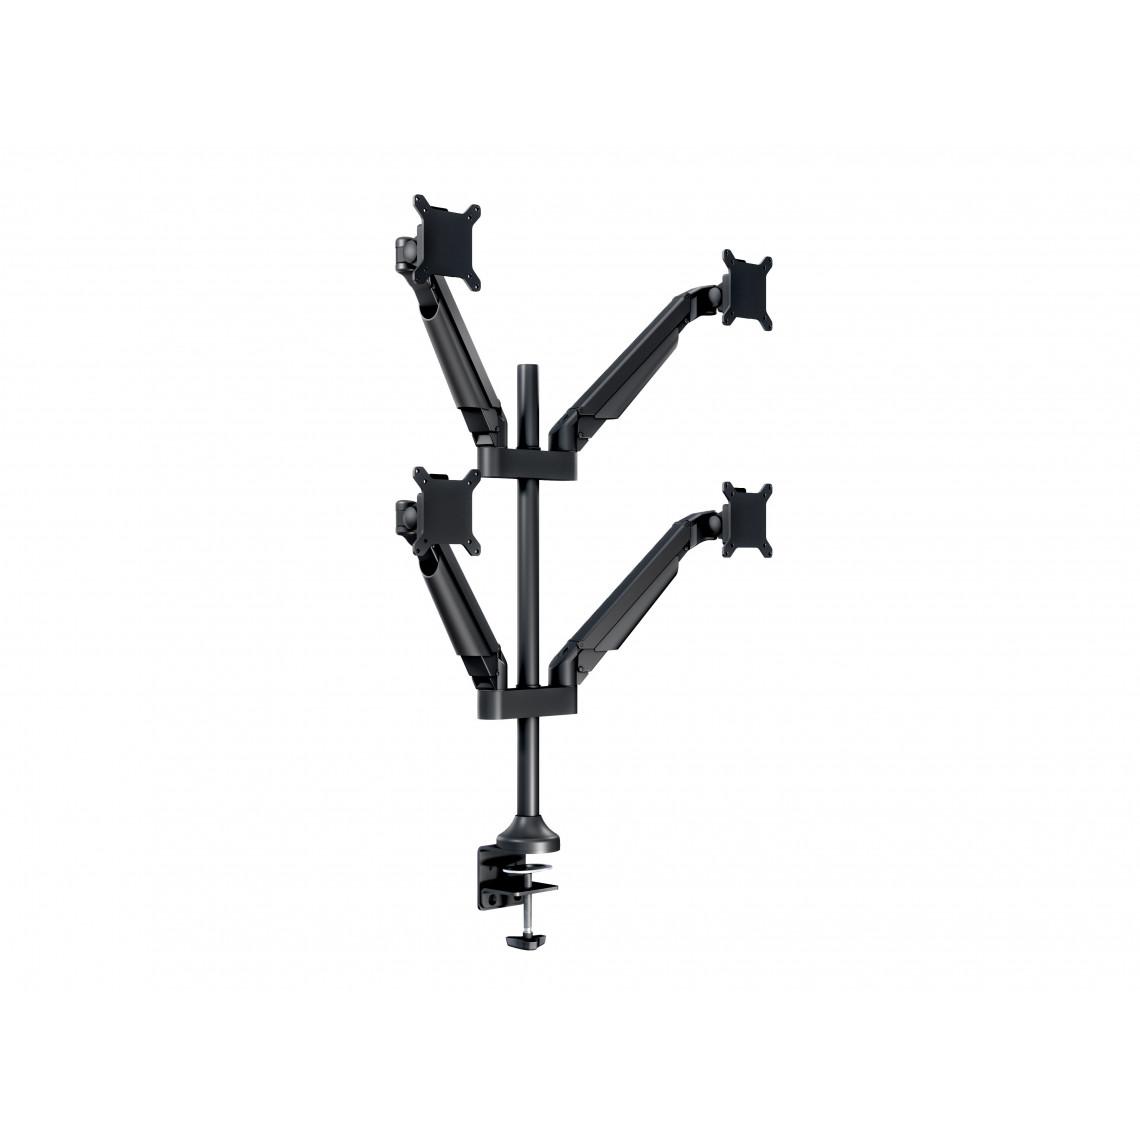 M VESA Gas Lift Arm Quad Black